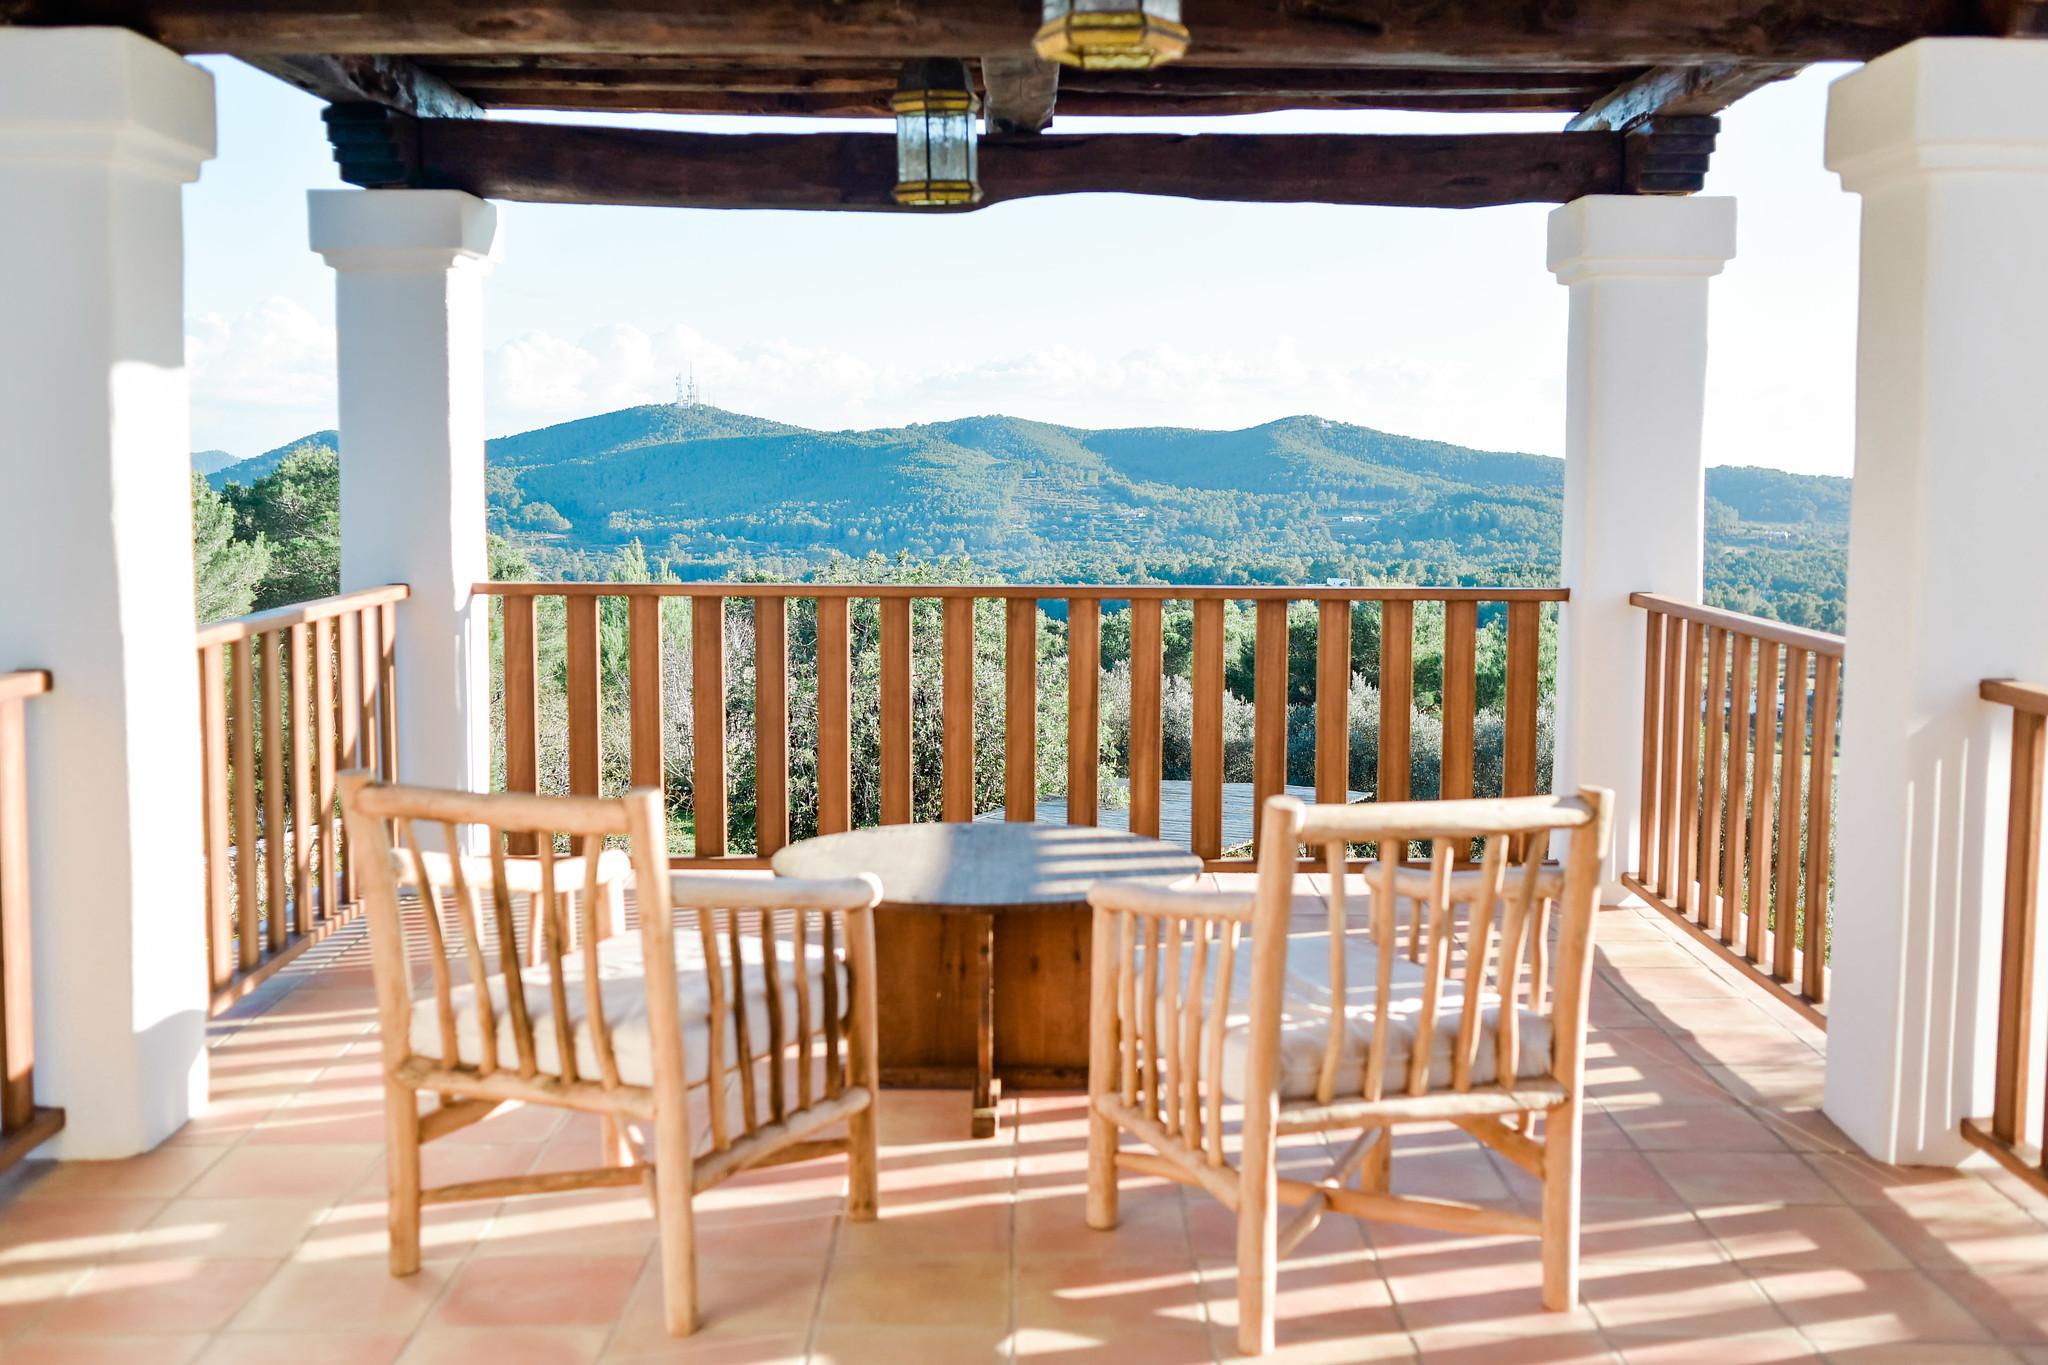 https://www.white-ibiza.com/wp-content/uploads/2020/05/white-ibiza-villas-can-lavanda-terrace-seating.jpg